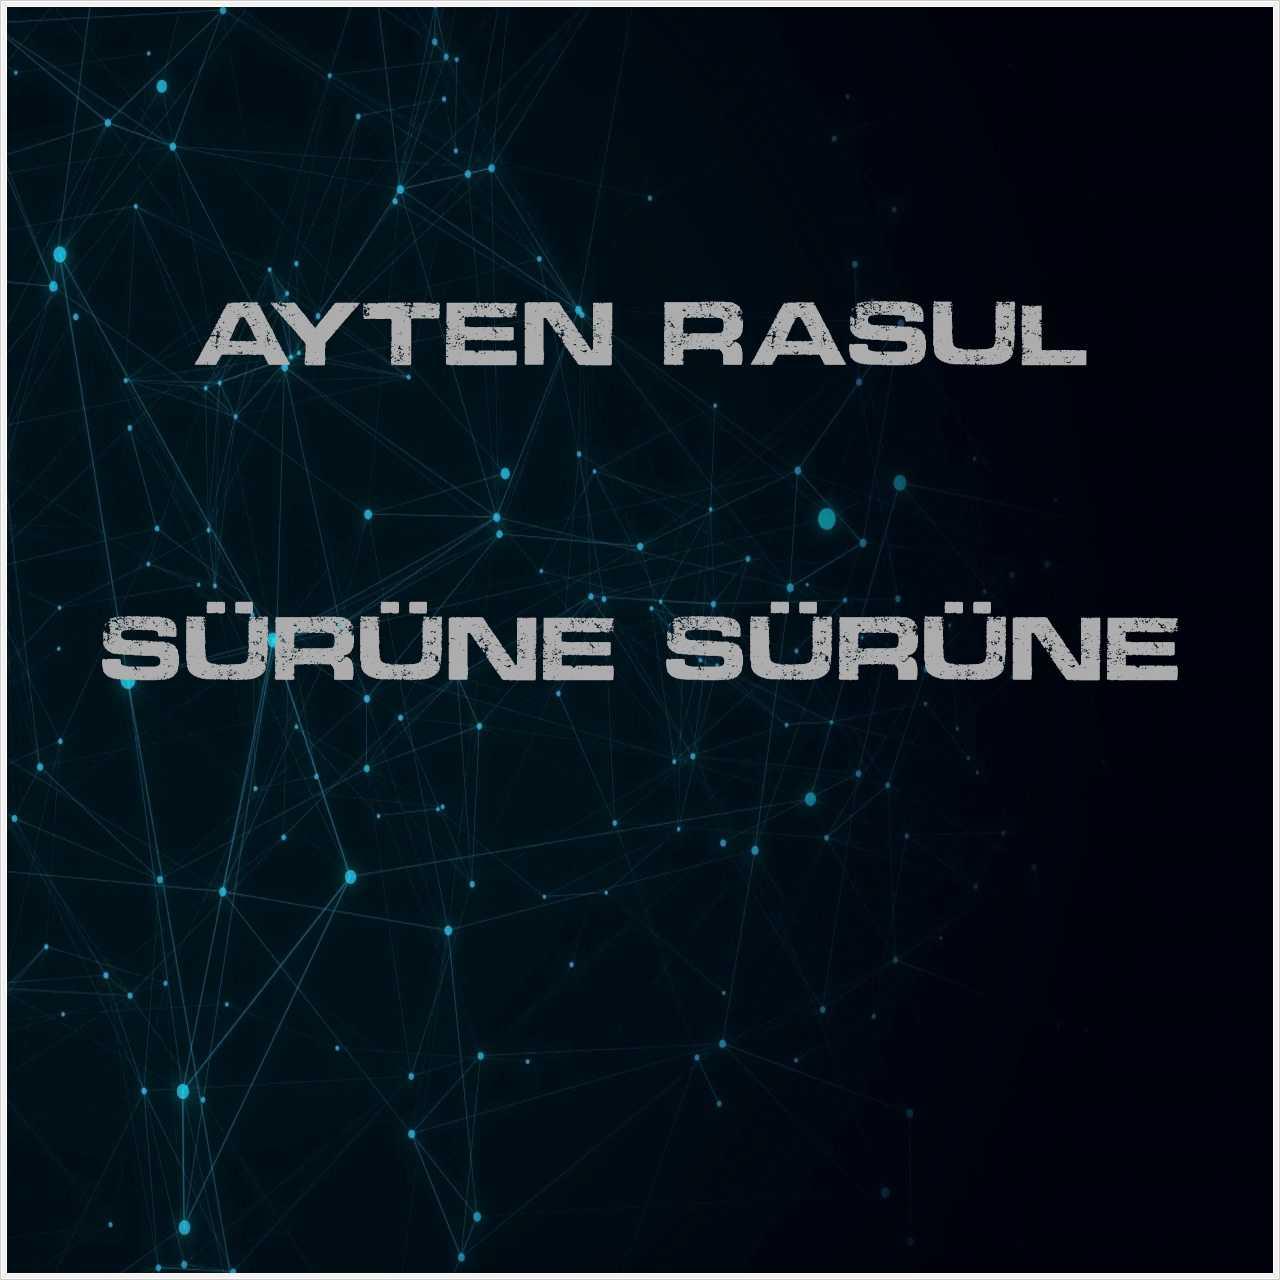 دانلود آهنگ جدید Ayten Rasul به نام Sürüne Sürüne